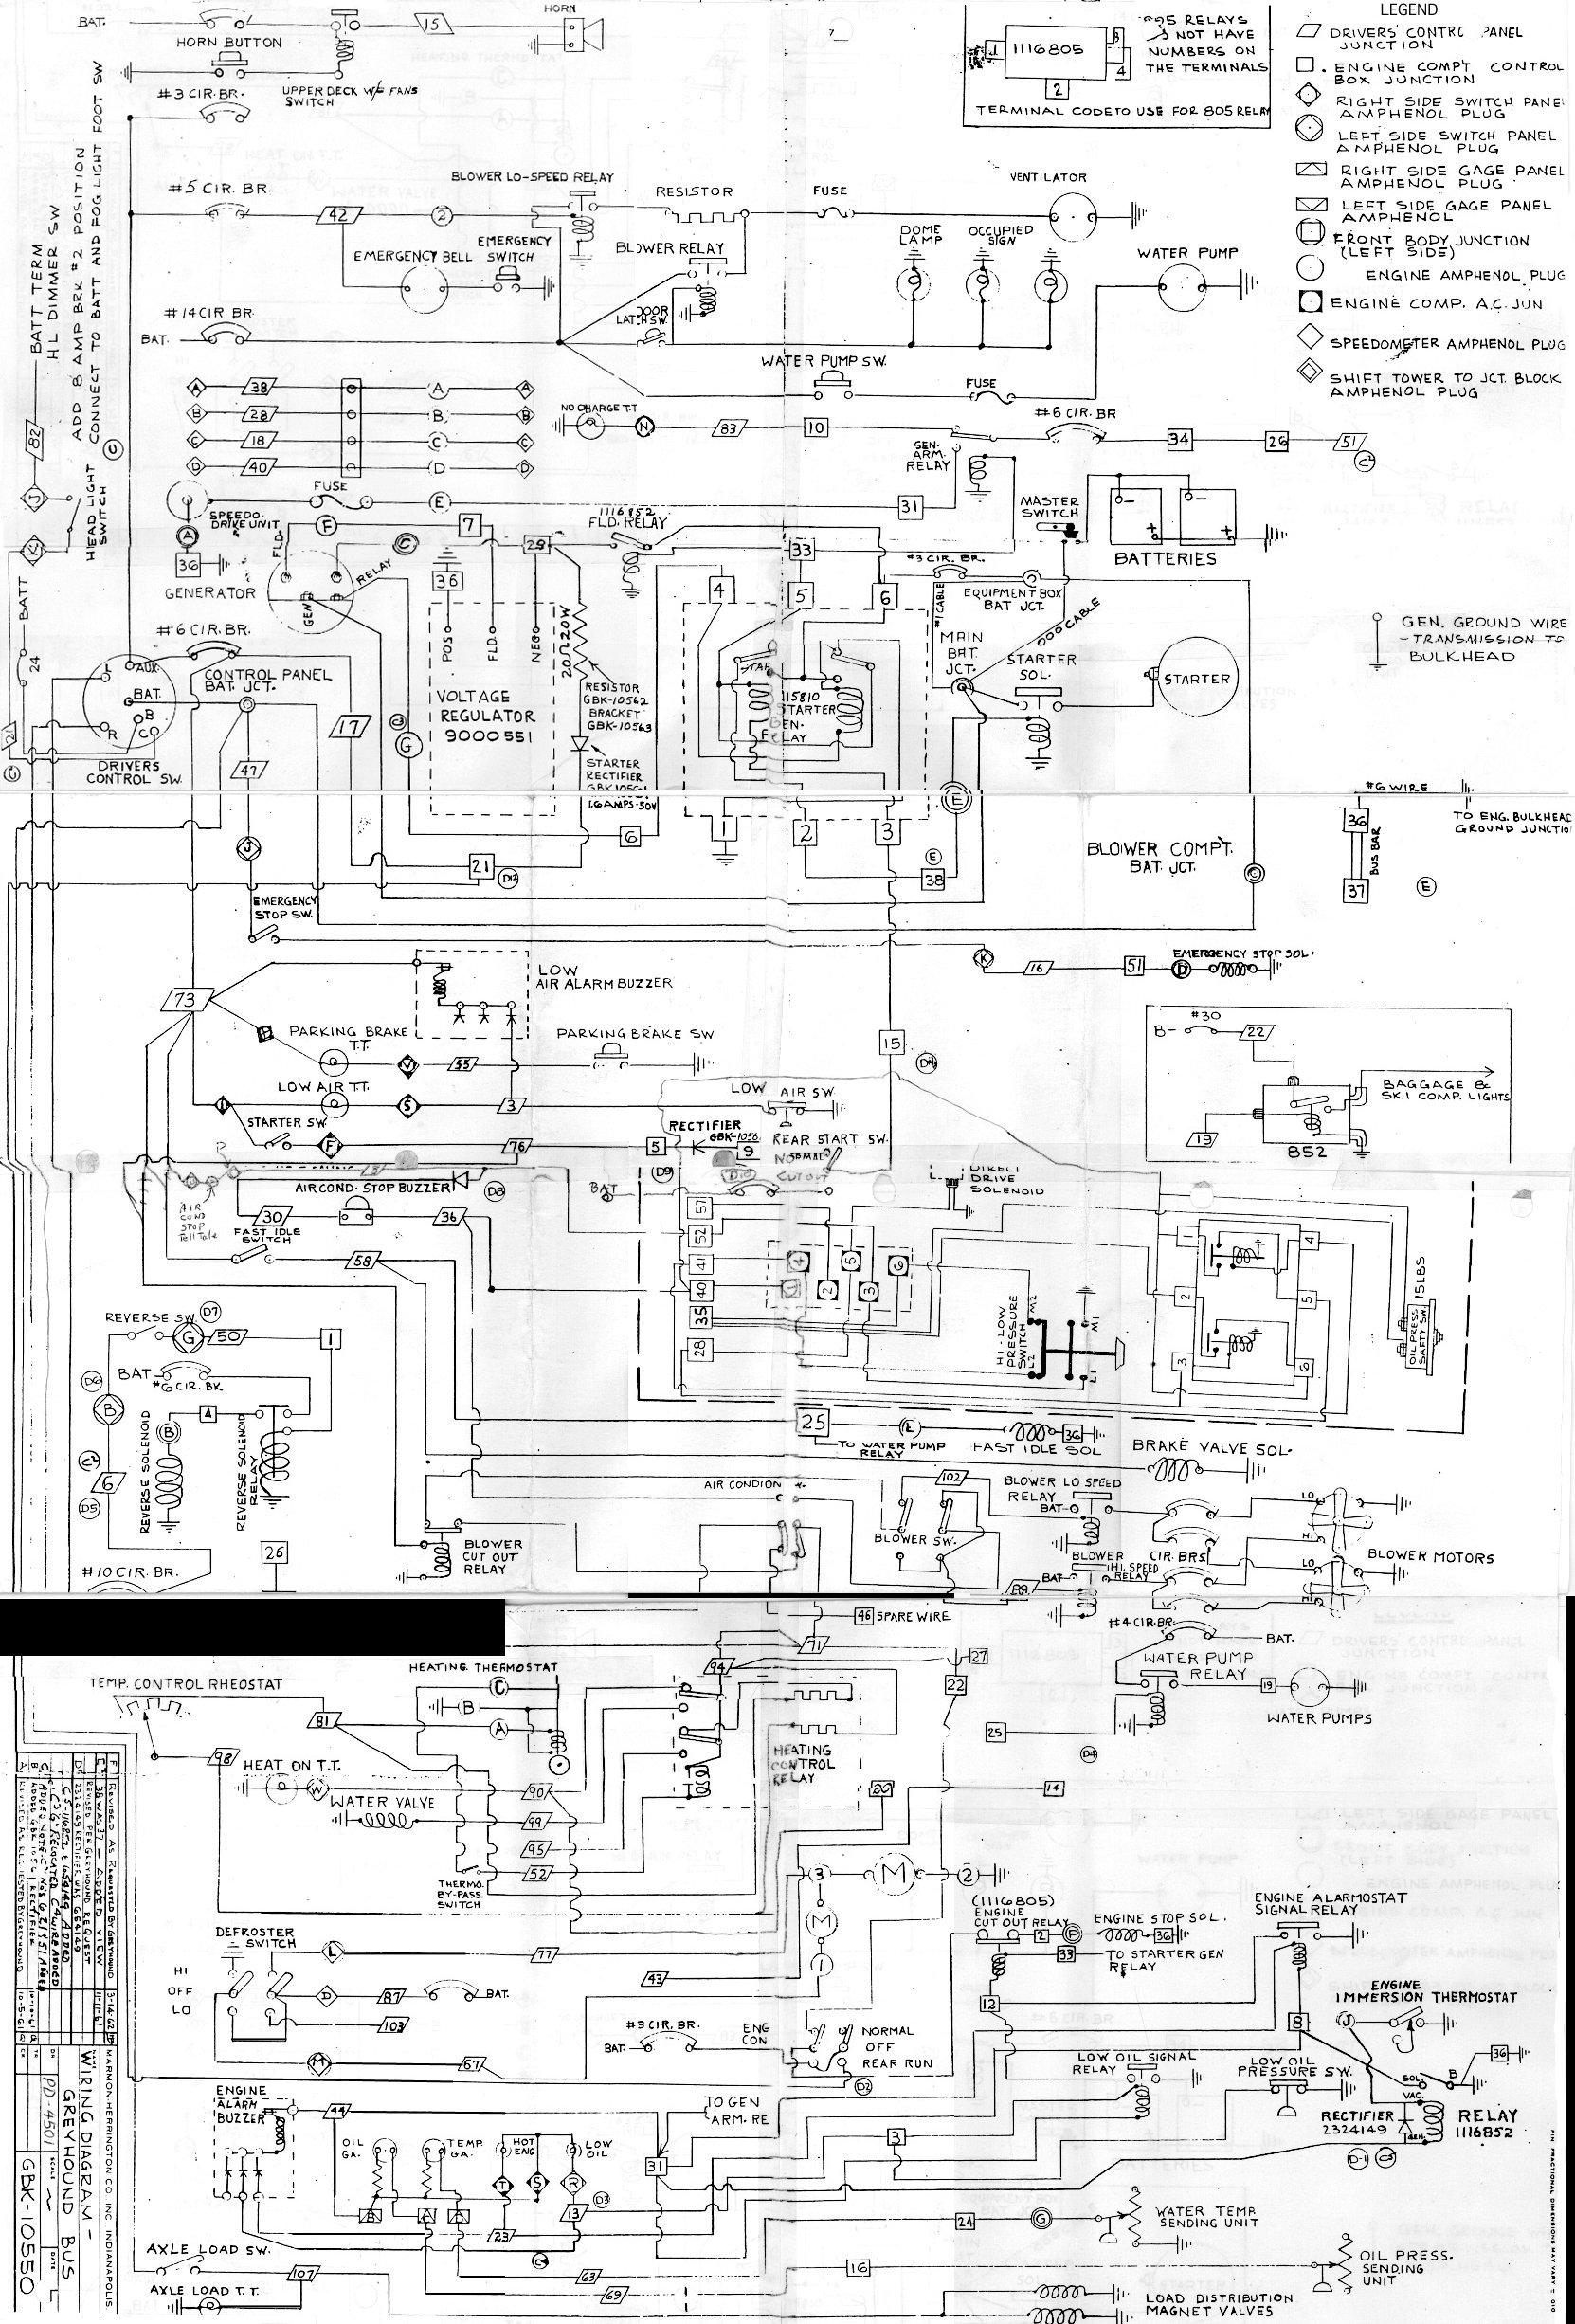 Astounding Lexus Rx 400H Wiring Diagram Auto Electrical Wiring Diagram Wiring Cloud Ittabpendurdonanfuldomelitekicepsianuembamohammedshrineorg